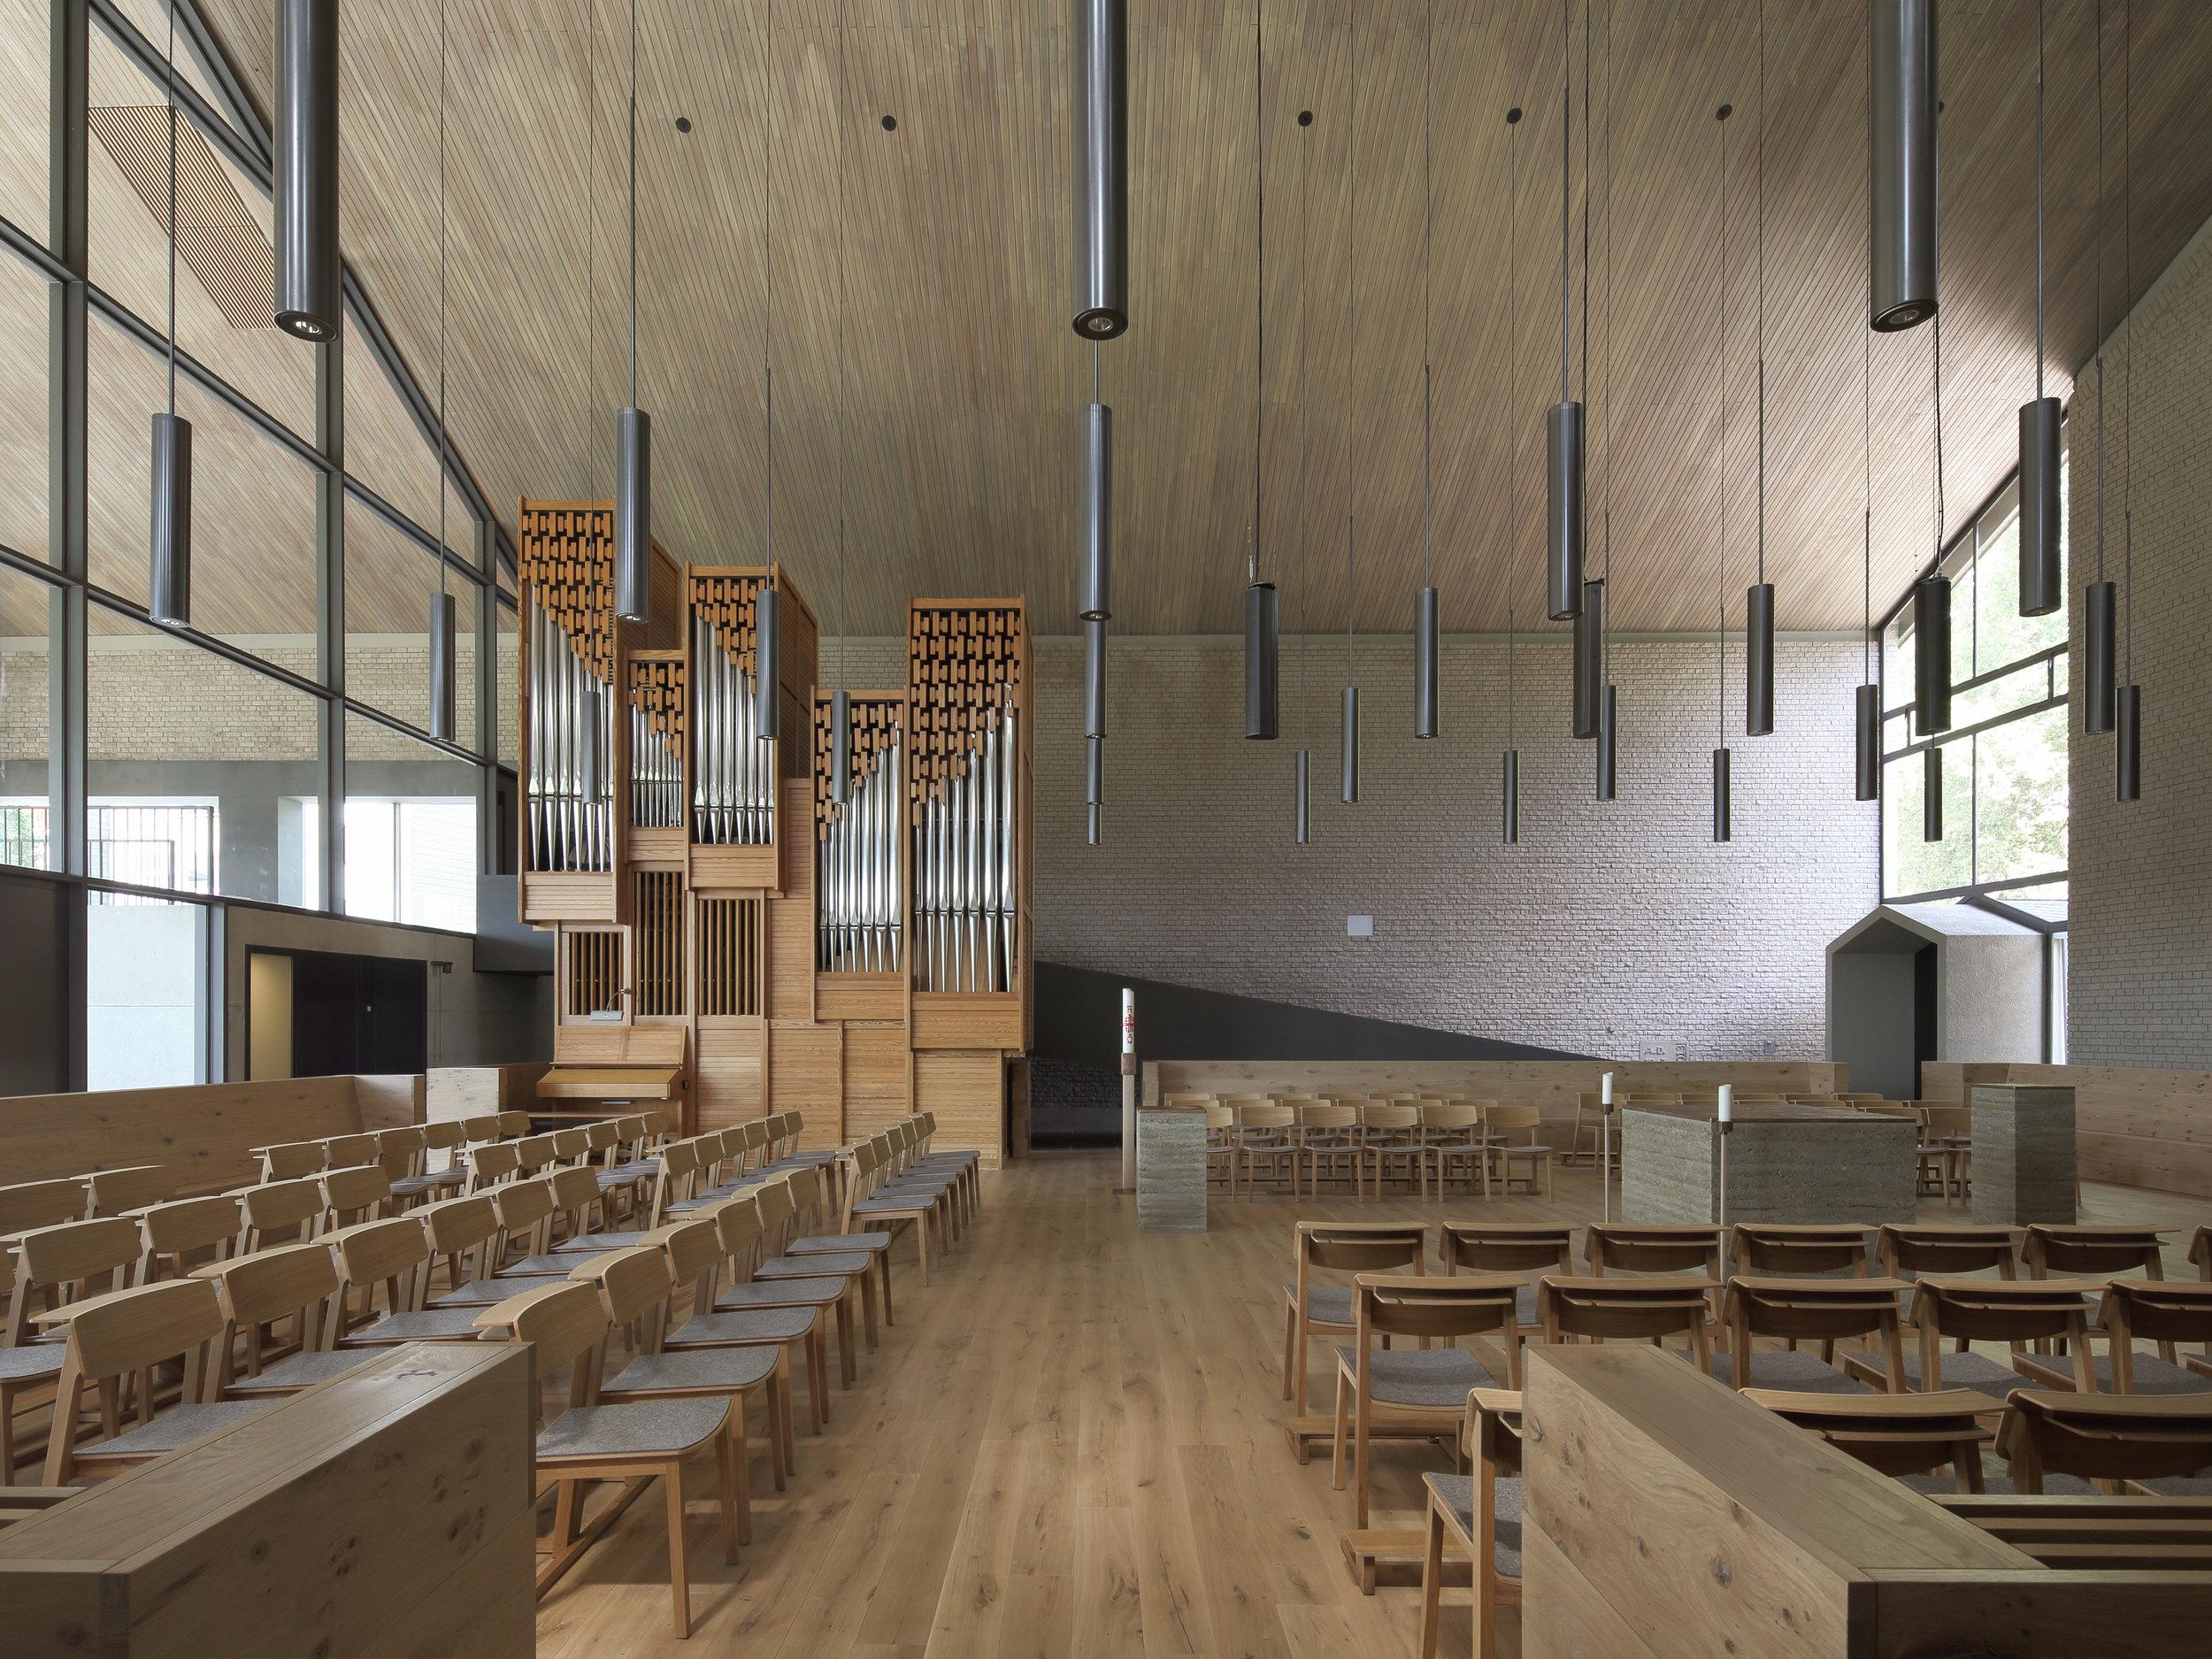 Internal view facing the organ